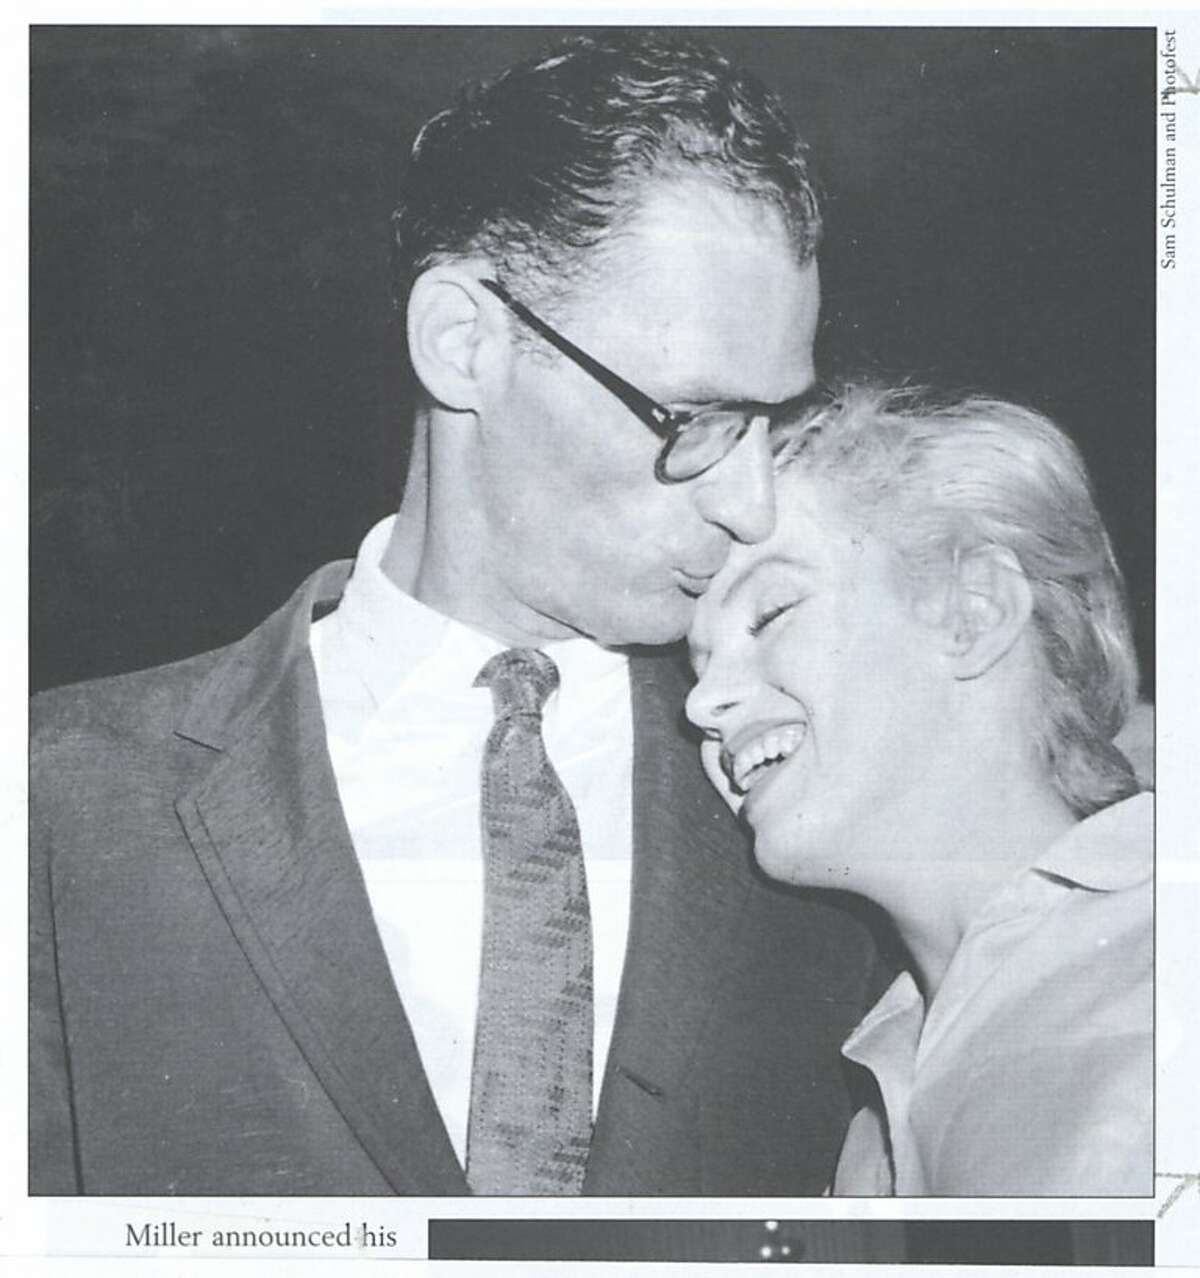 Arthur Miller and Marilyn Monroe in 1956.